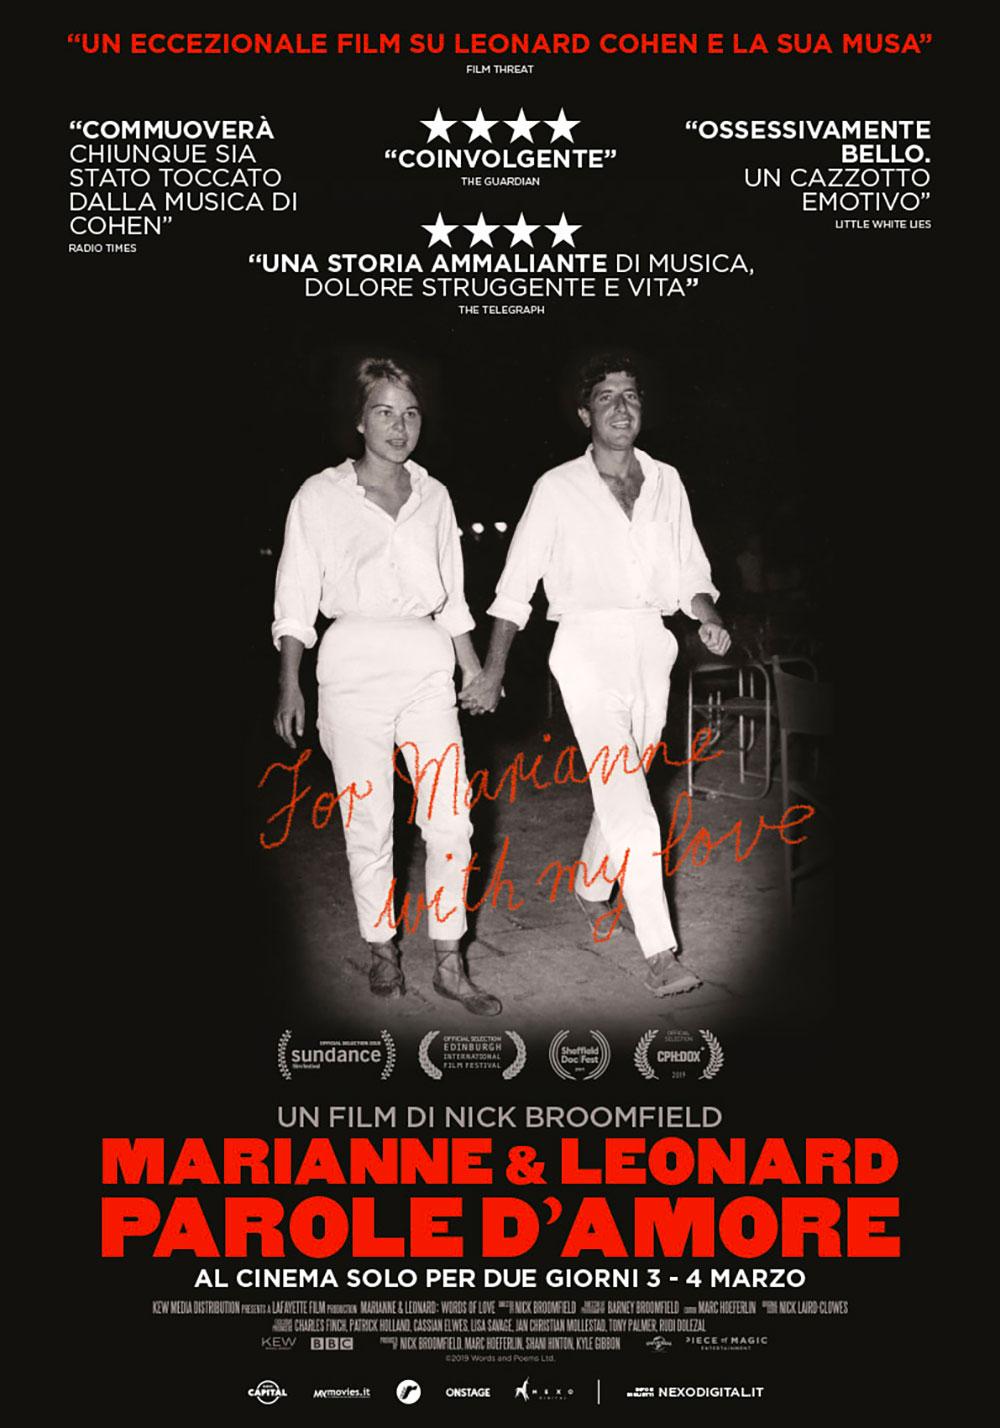 MARIANNE & LEONARD, PAROLE D'AMORE